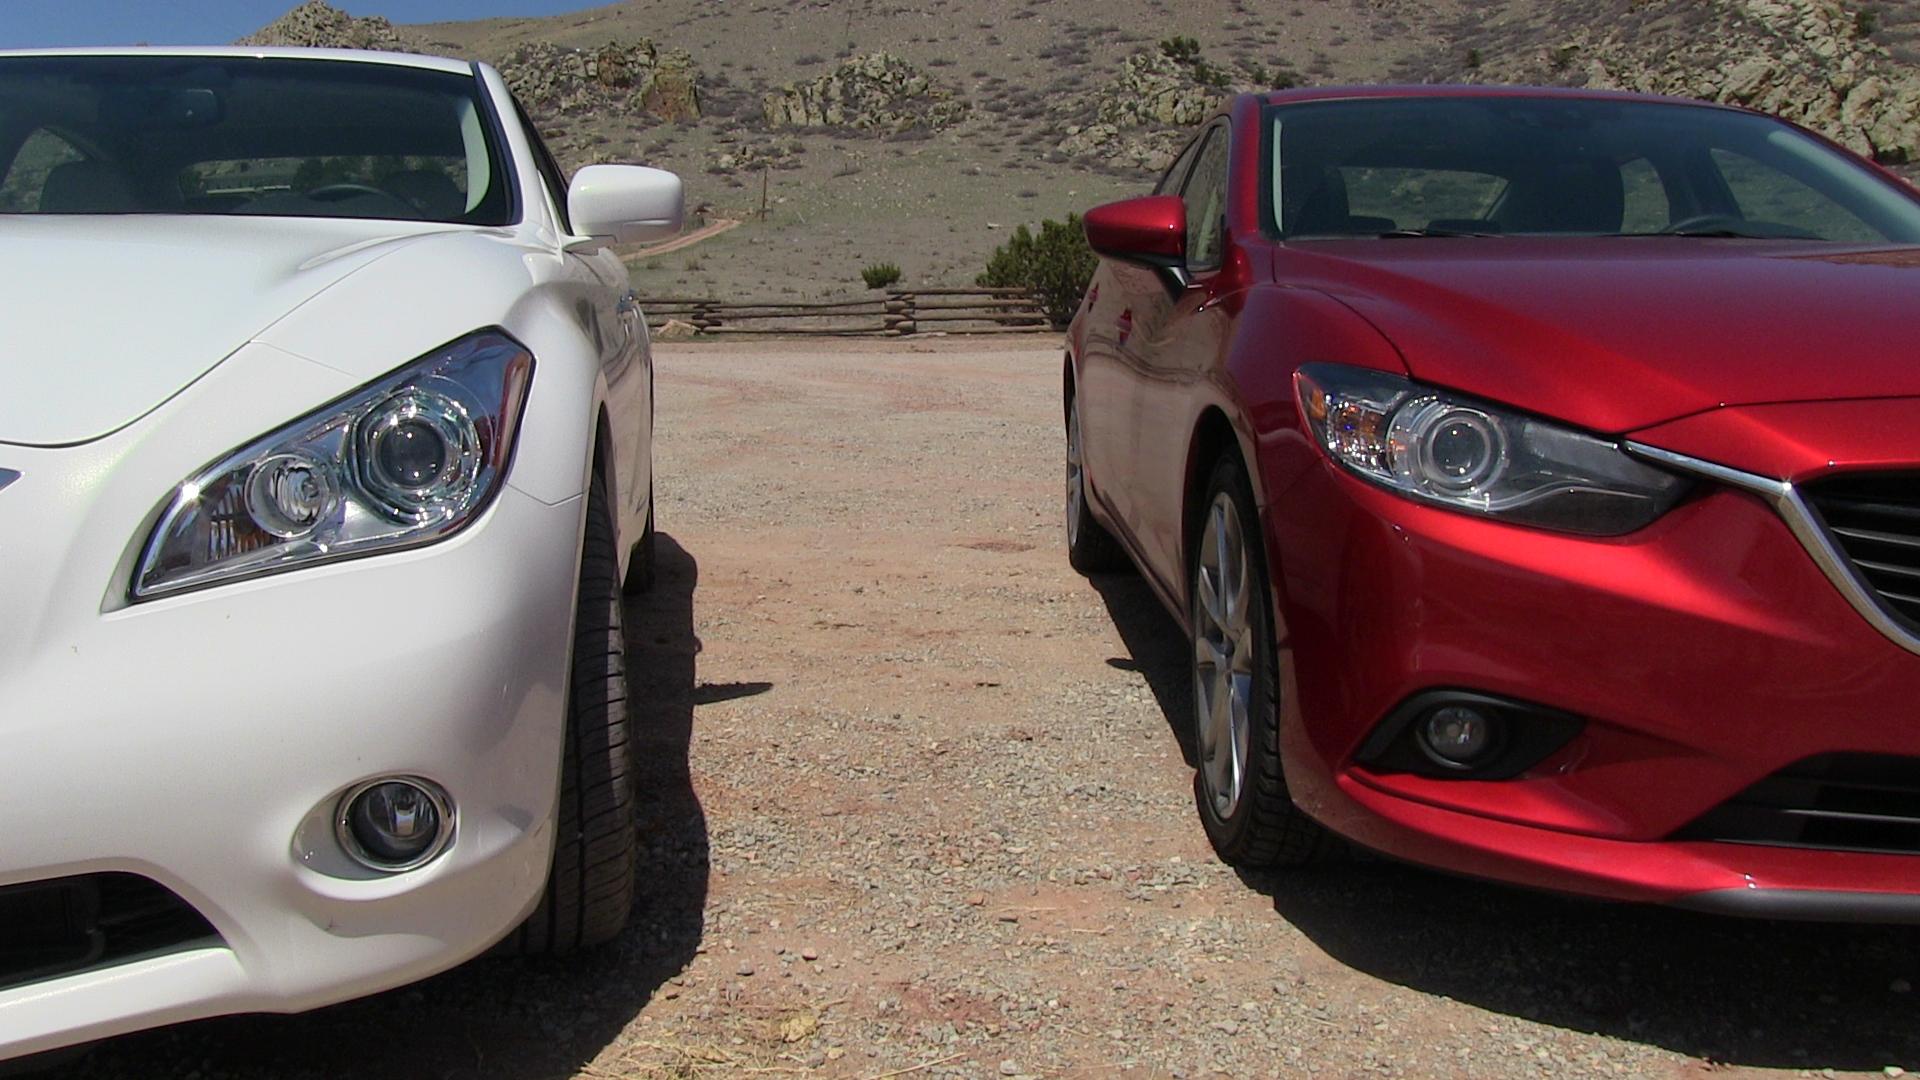 2014 Mazda6 Vs Infiniti M35 Hybrid Technology Mashup Review The